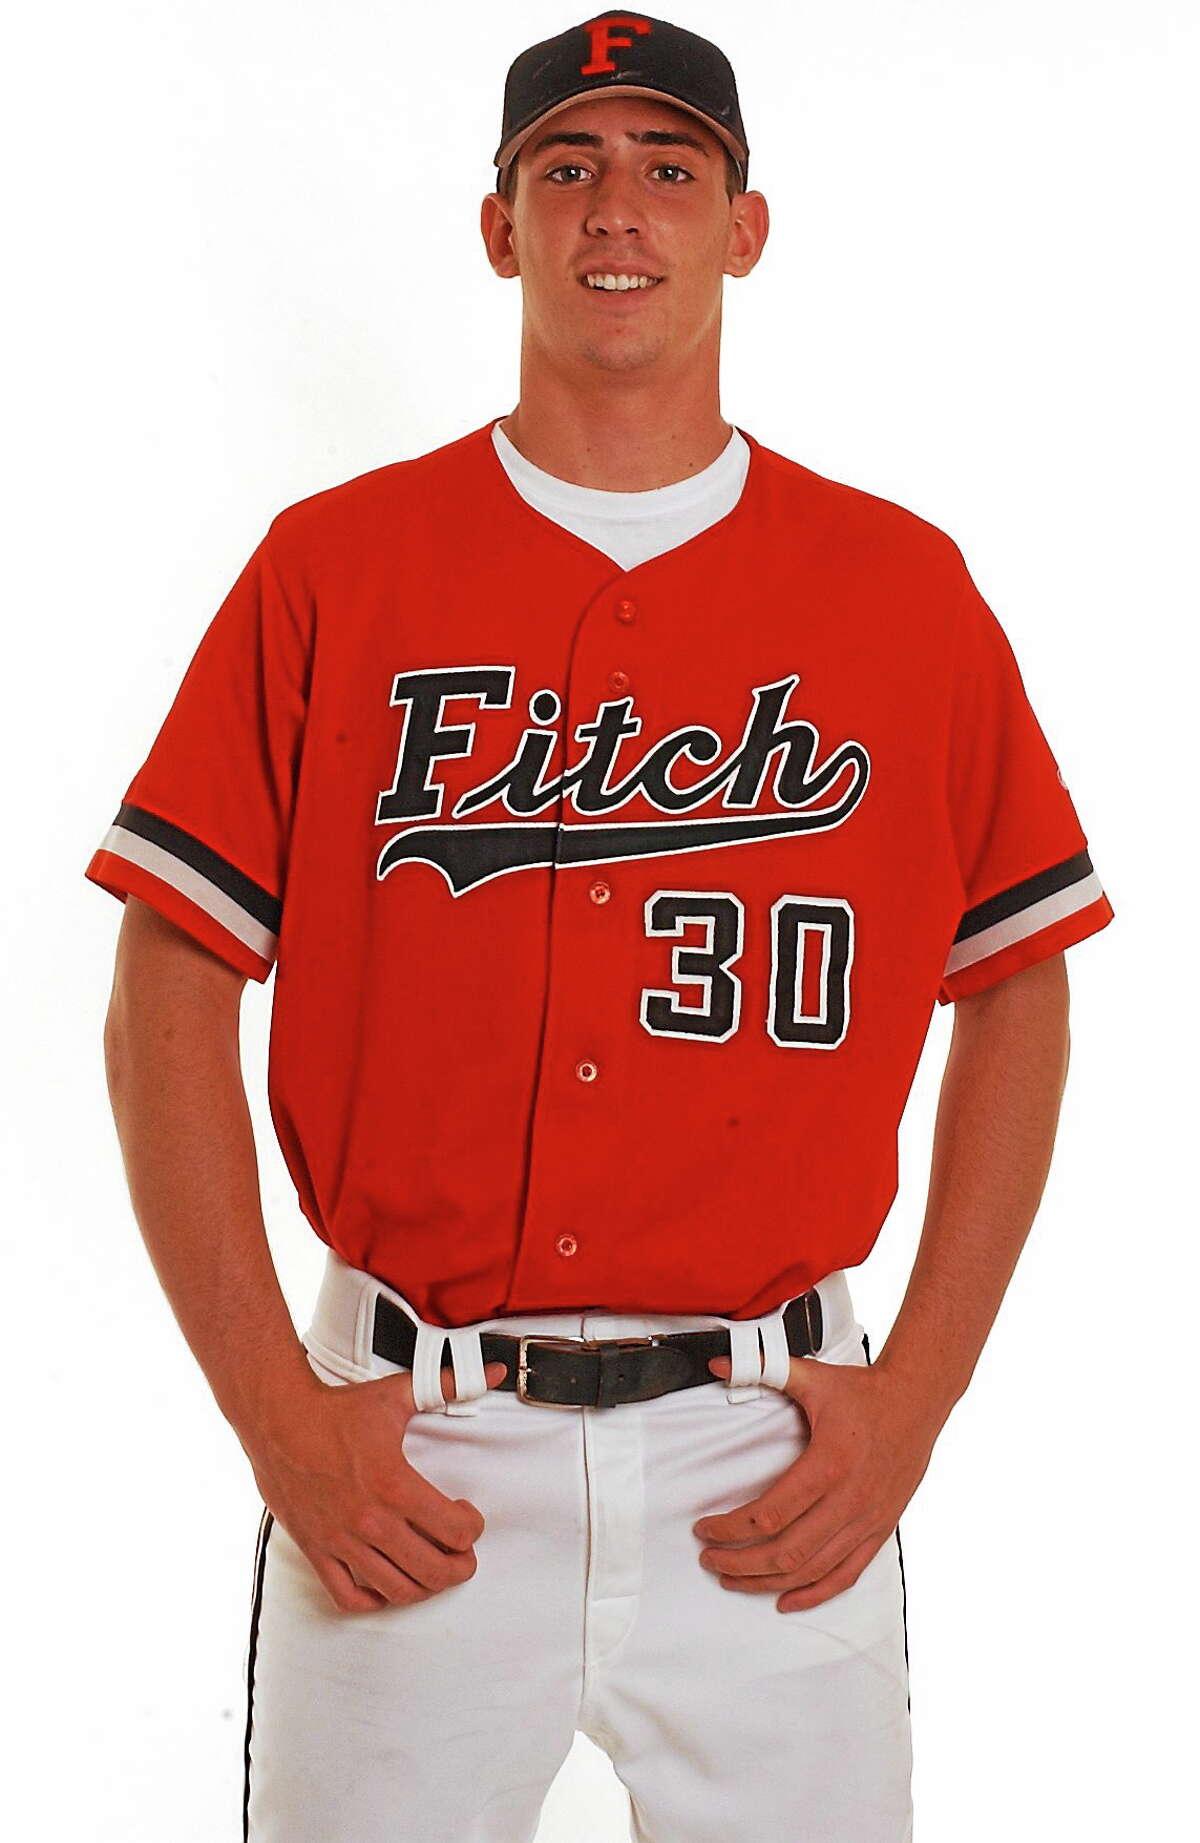 Fitch's Matt Harvey